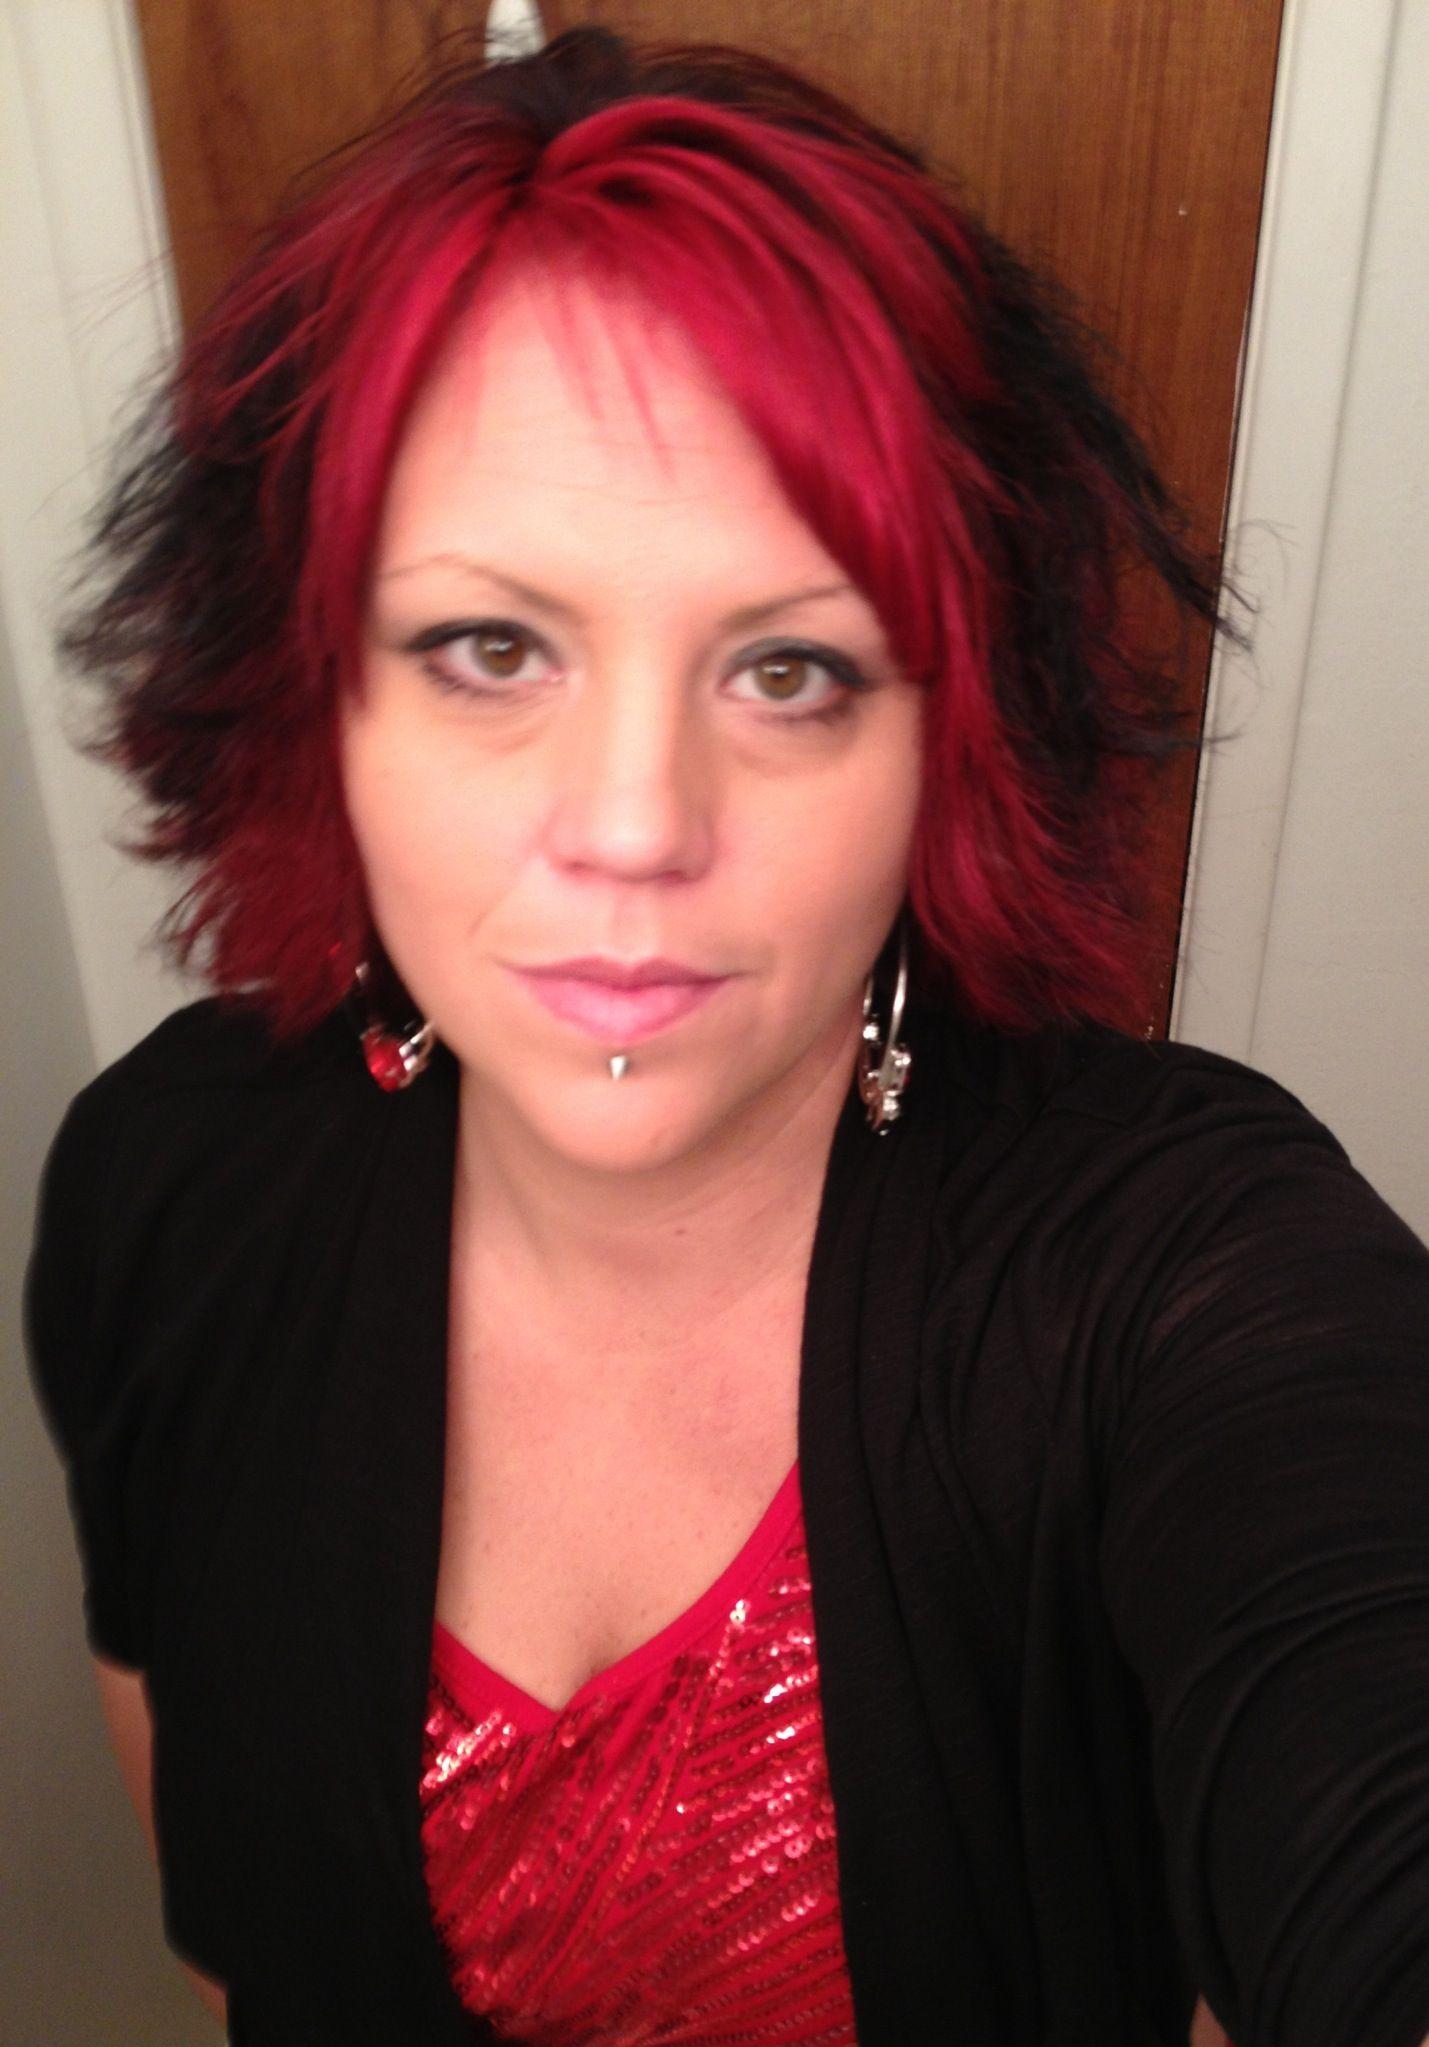 Splat Hair Dye Splat Hair Dye Hair Hair Color